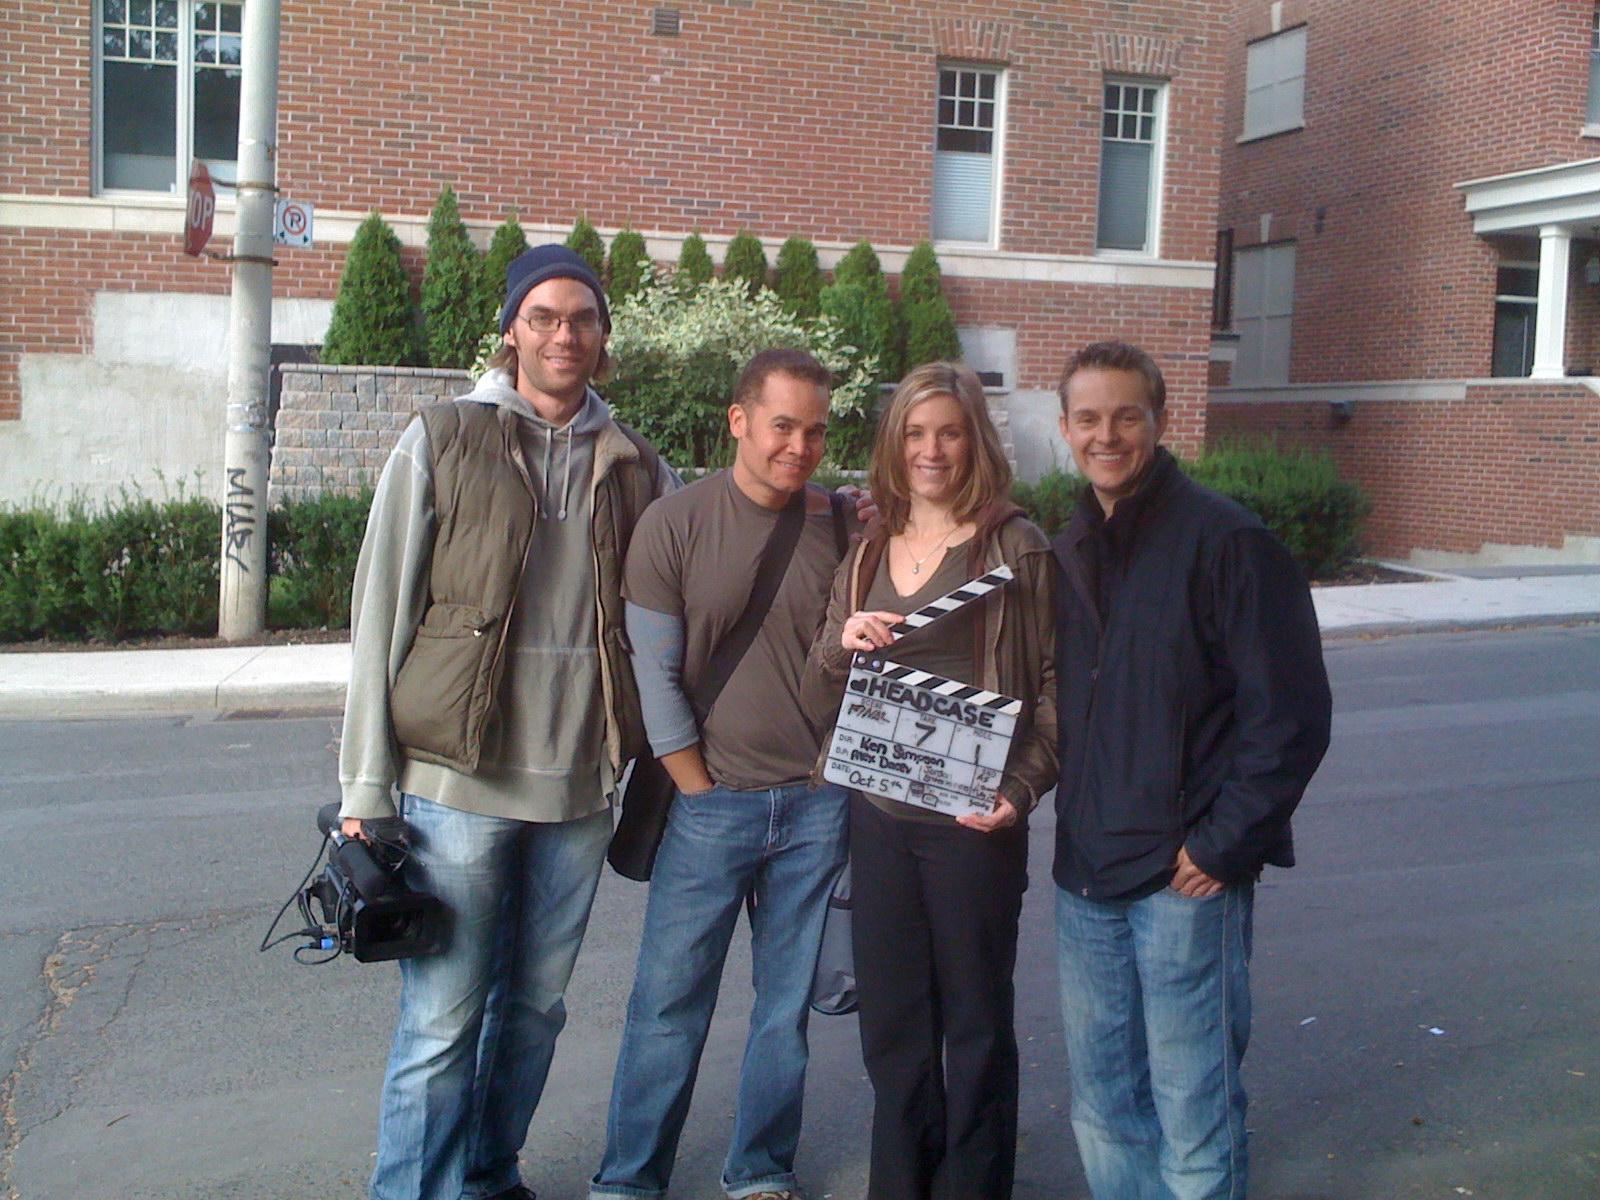 From Left to Right: Ken Simpson, Anthony Greene, Jodi Behan & Alex Jordan